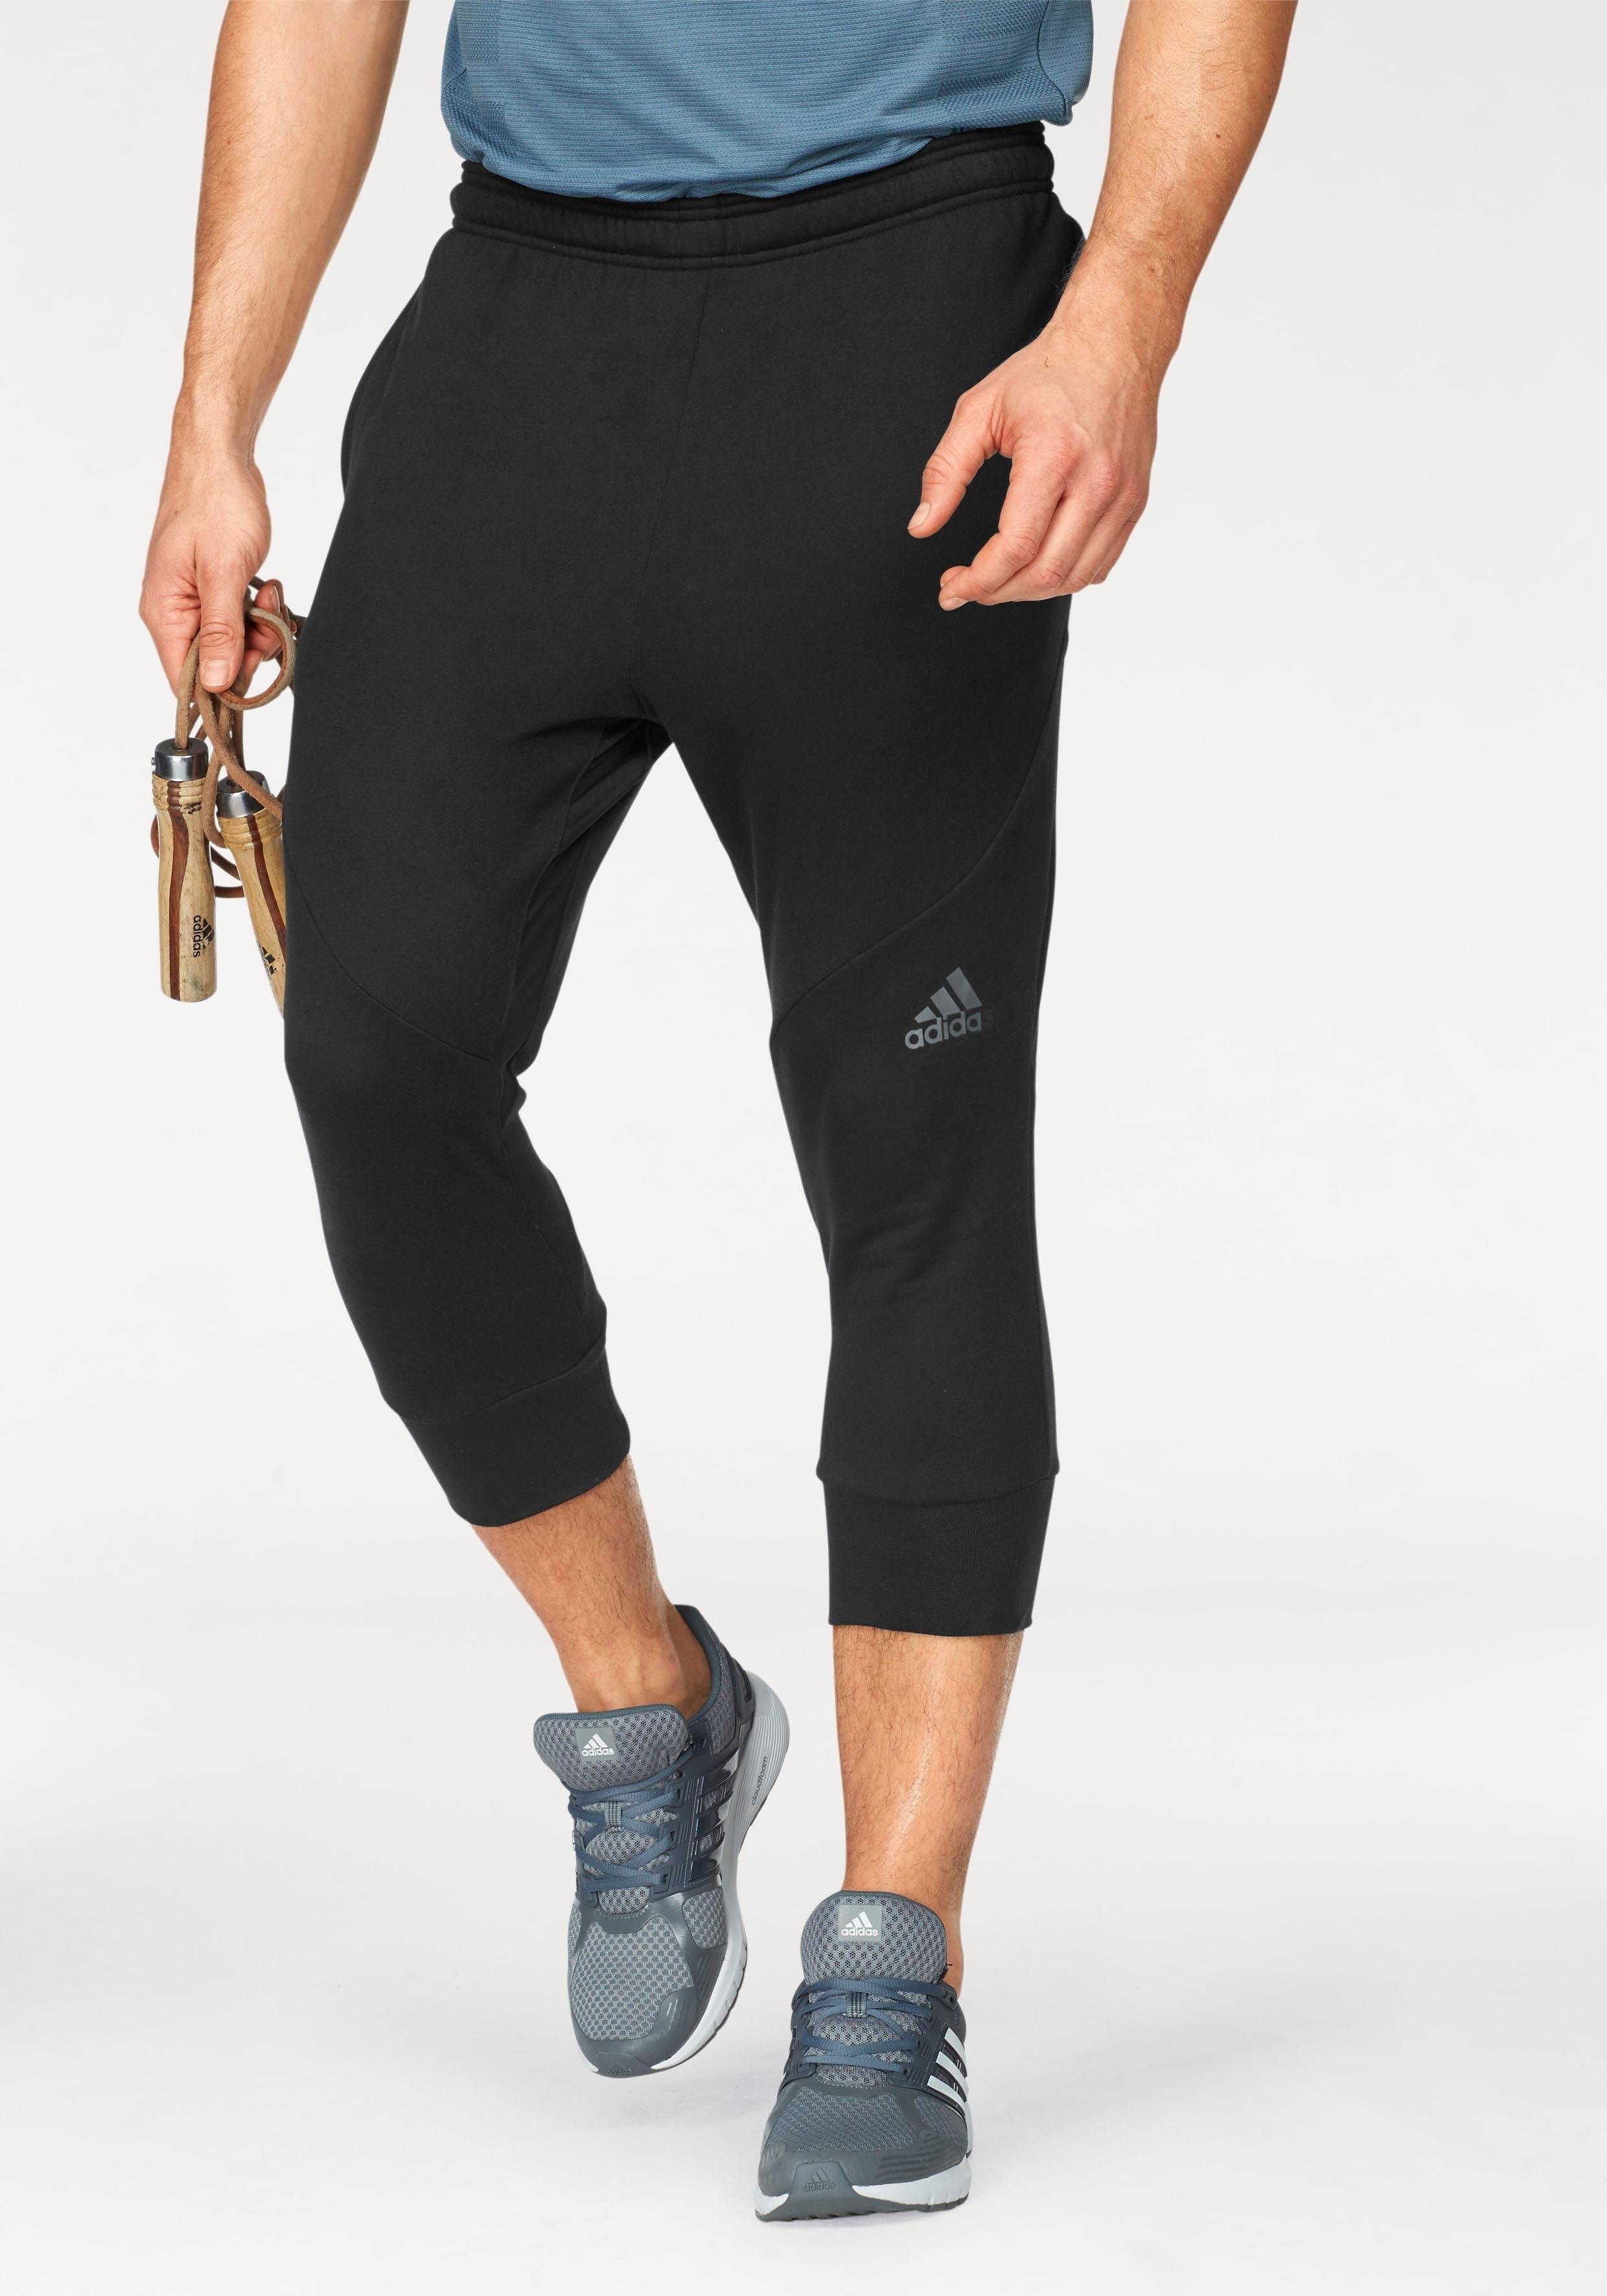 3 Kwart Zwembroek.Adidas Performance Driekwartbroek Workout Pant Climacool 3 4 Woven